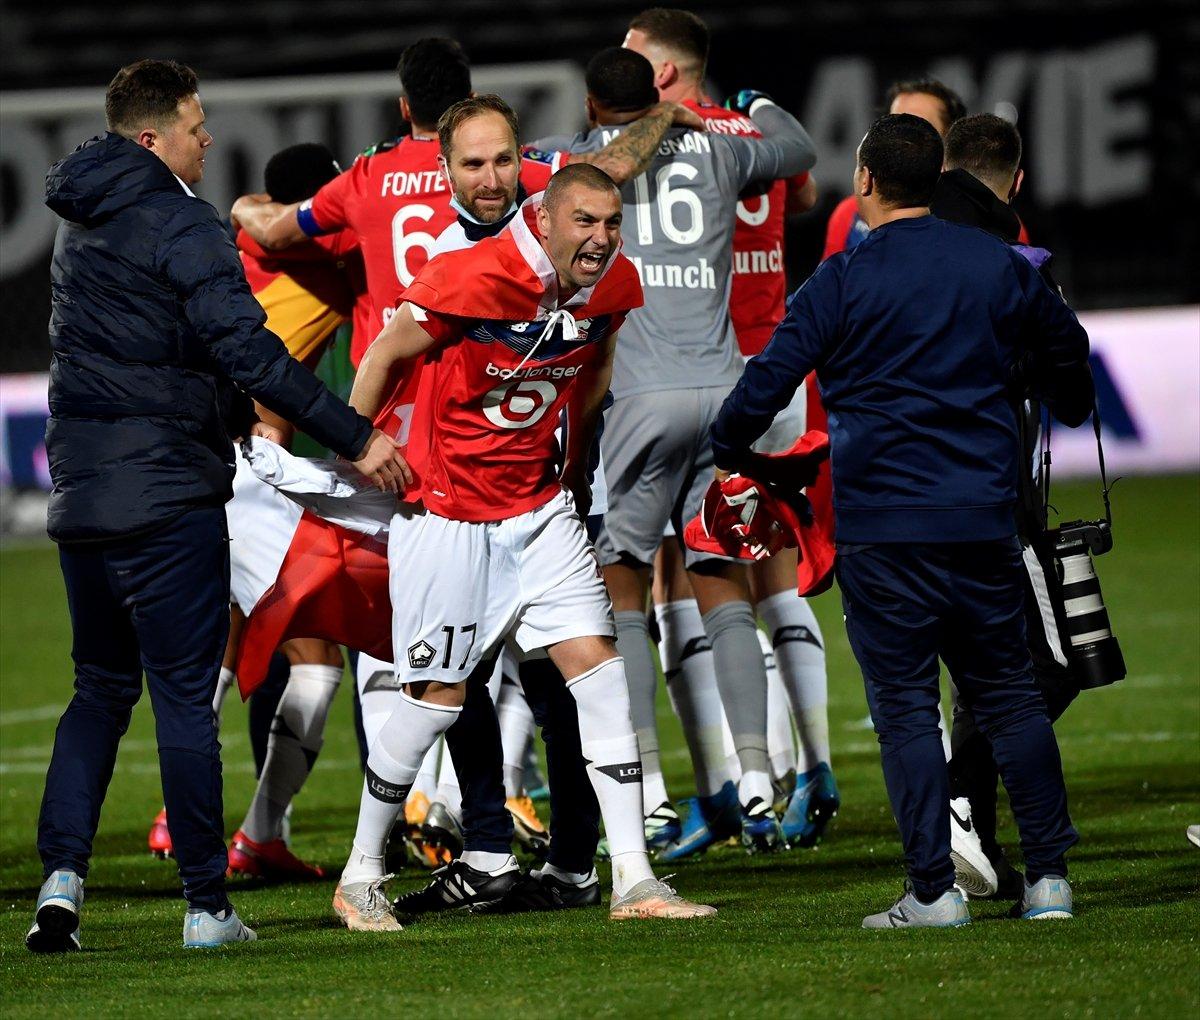 Lille, Fransa Ligue 1'de şampiyon oldu #4